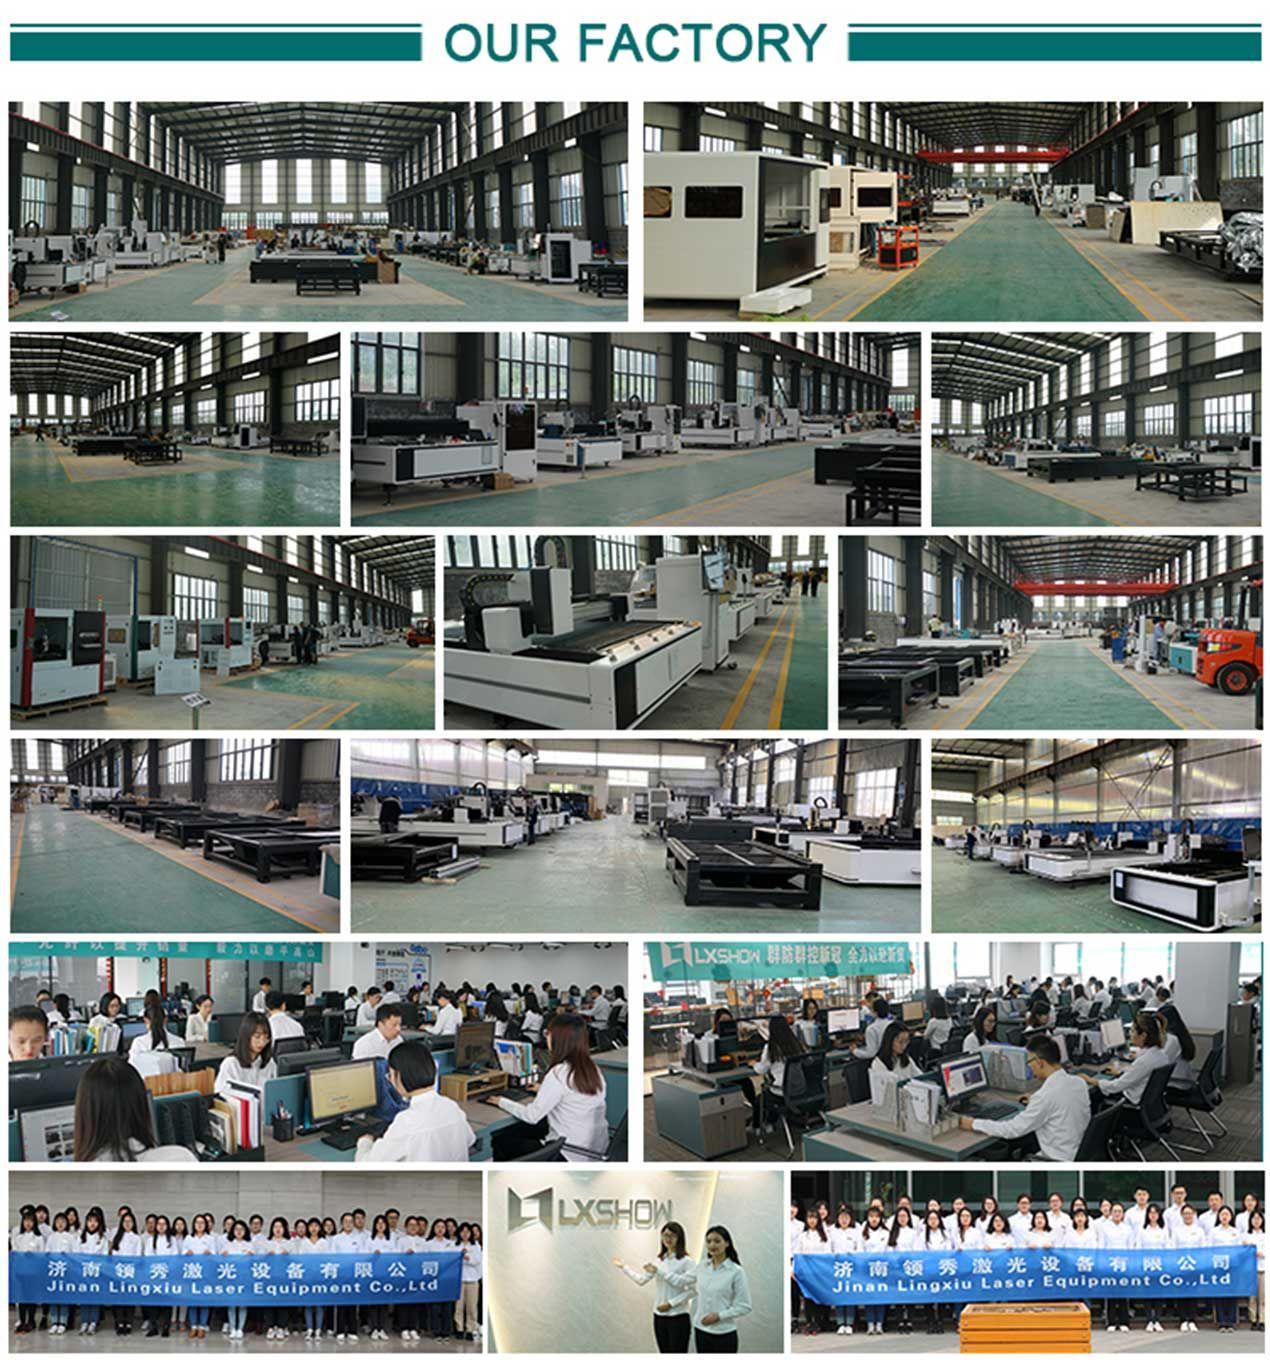 LX62THA Automatic Loading and Unloading Square tube and circle tube Metal pipe Fiber laser cutting machine 1000 1500 2000 3000 4000 6000 8000 watt